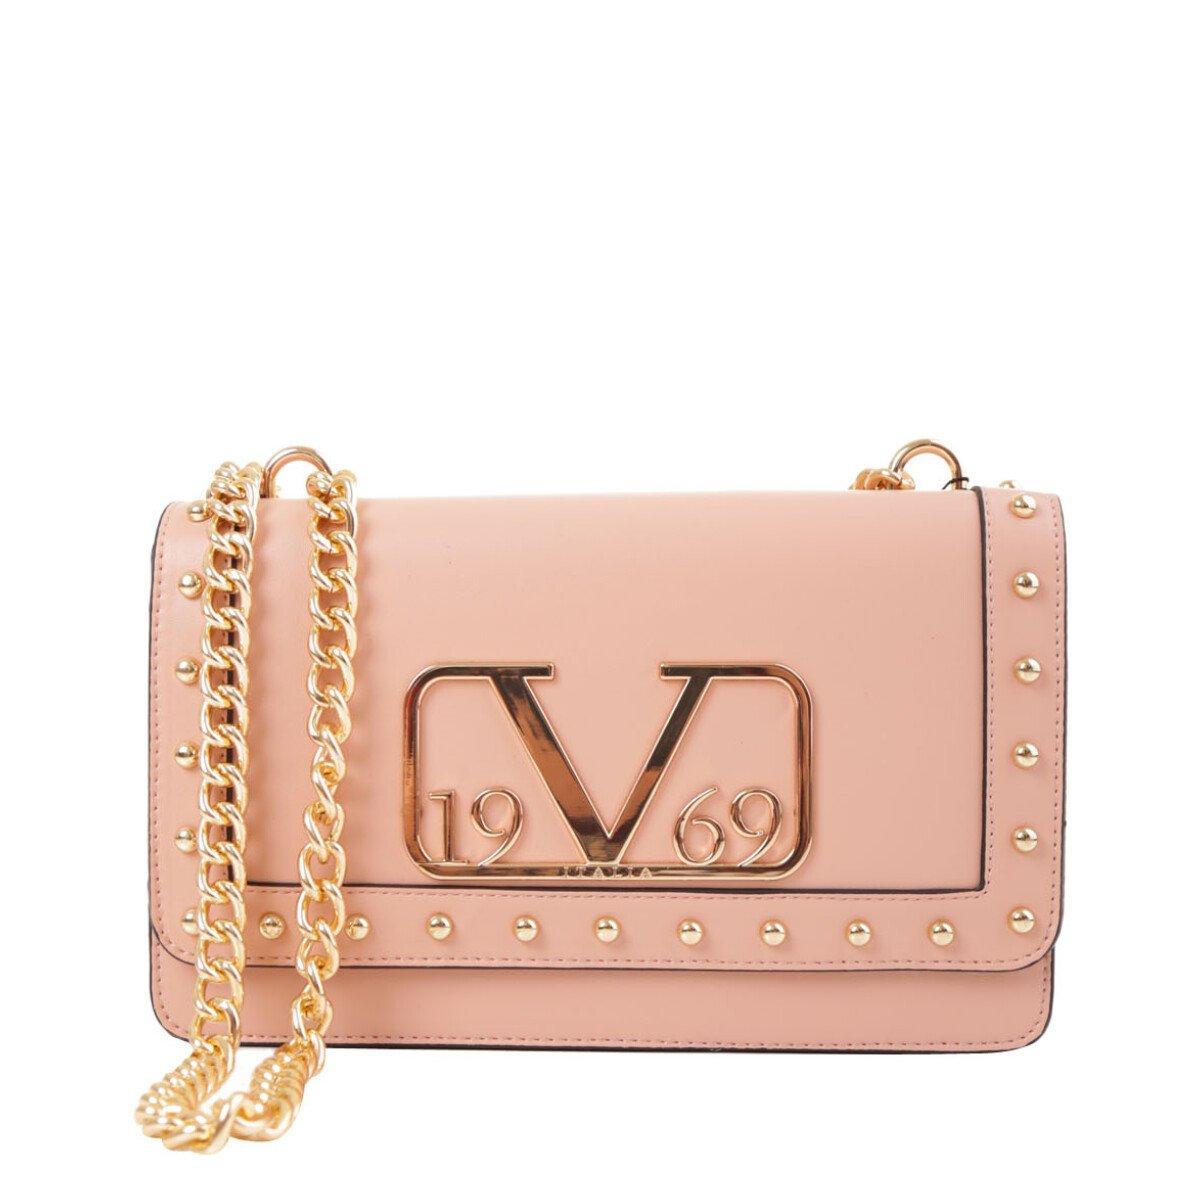 19v69 Italia Women's Shoulder Bag Various Colours 318683 - pink UNICA